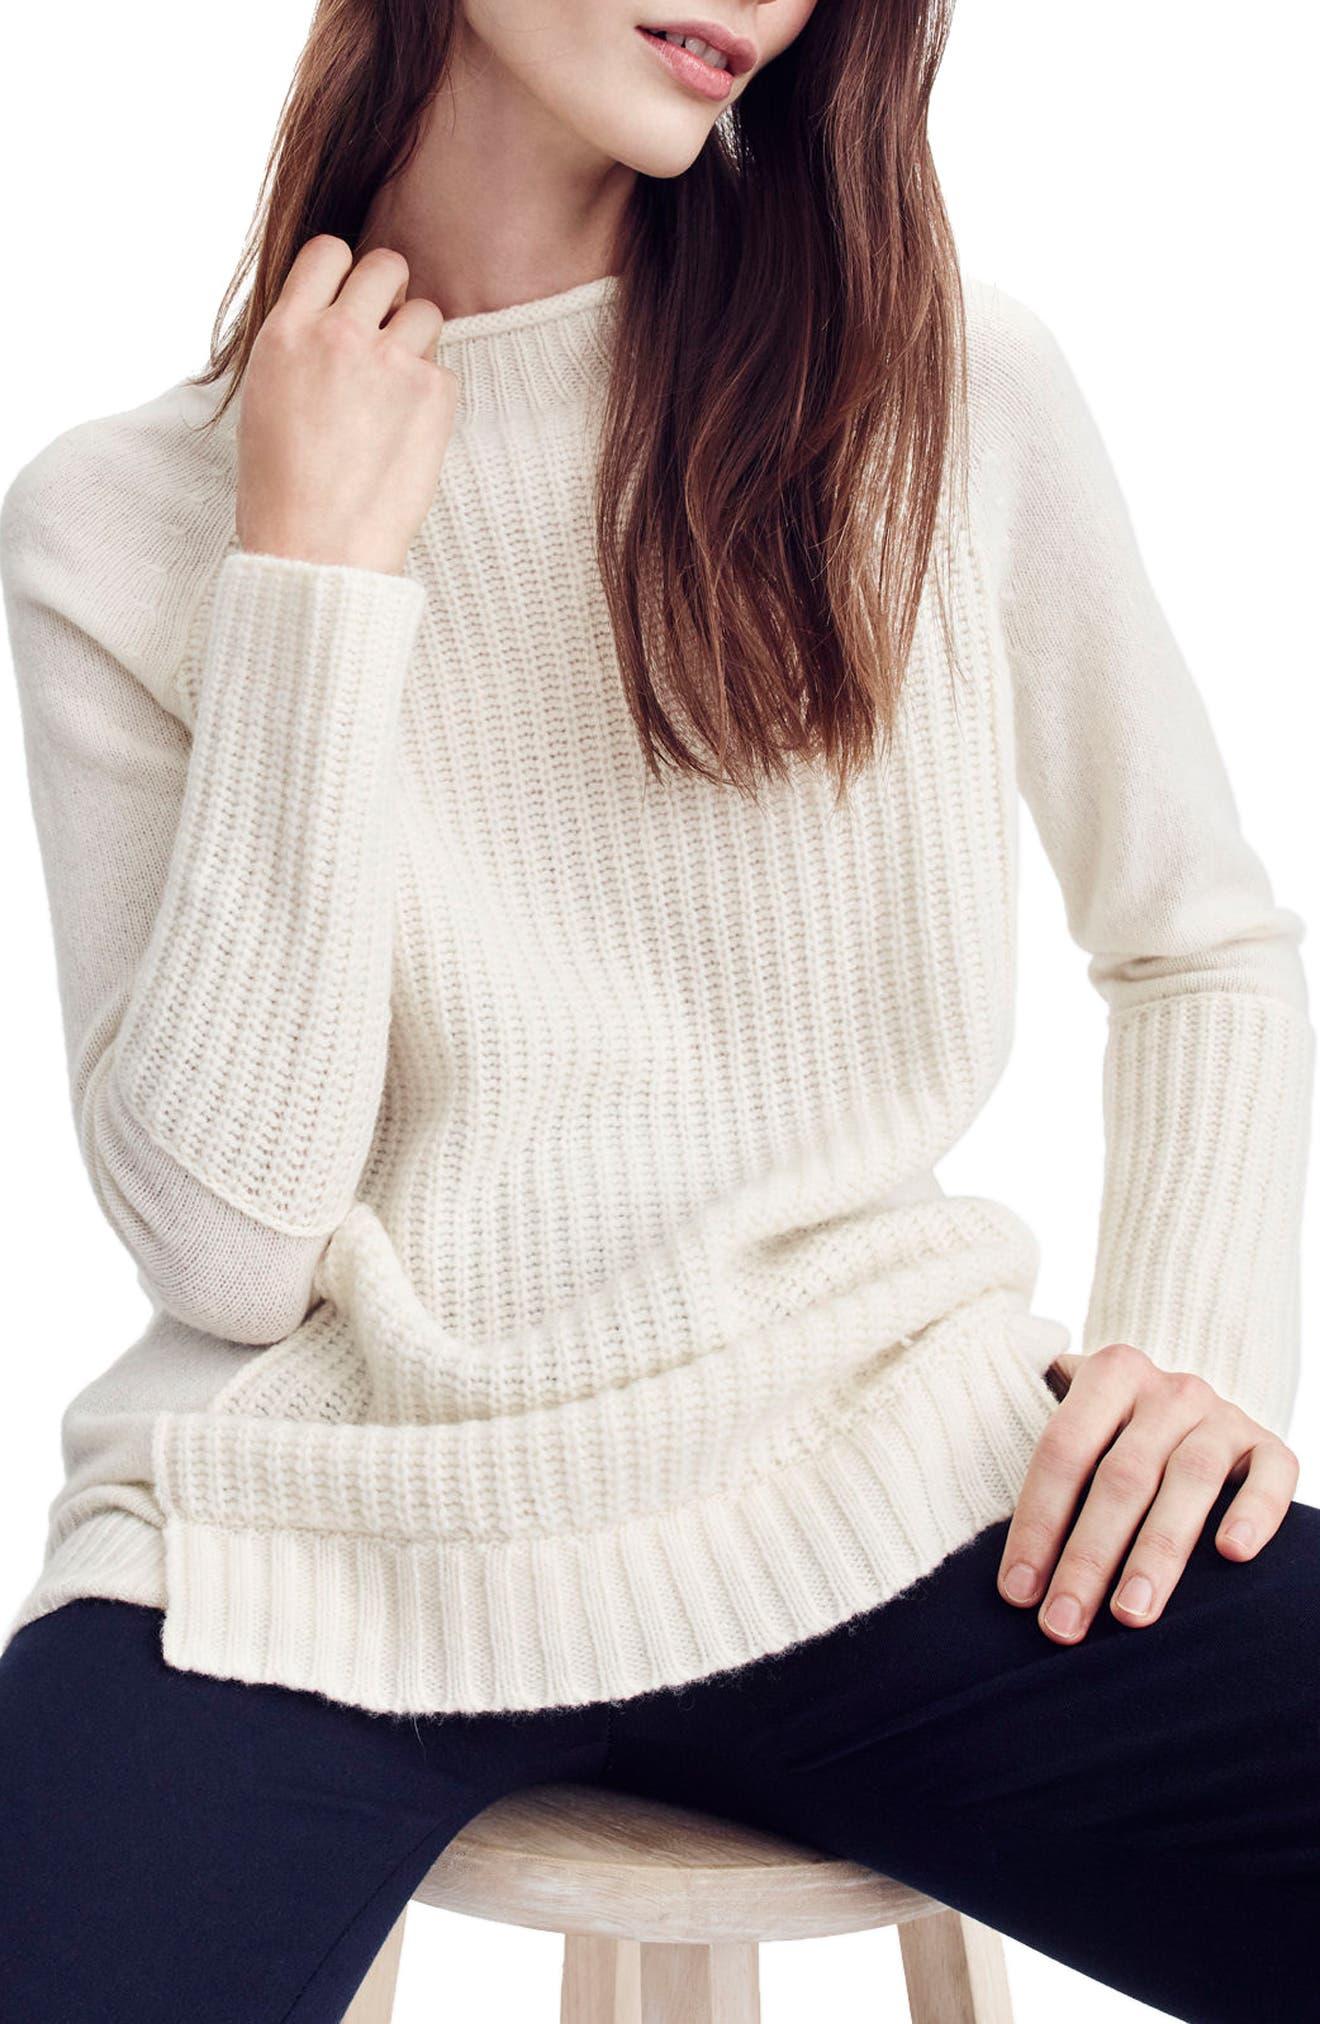 Main Image - J.Crew New England Mock Neck Wool Tunic Sweater